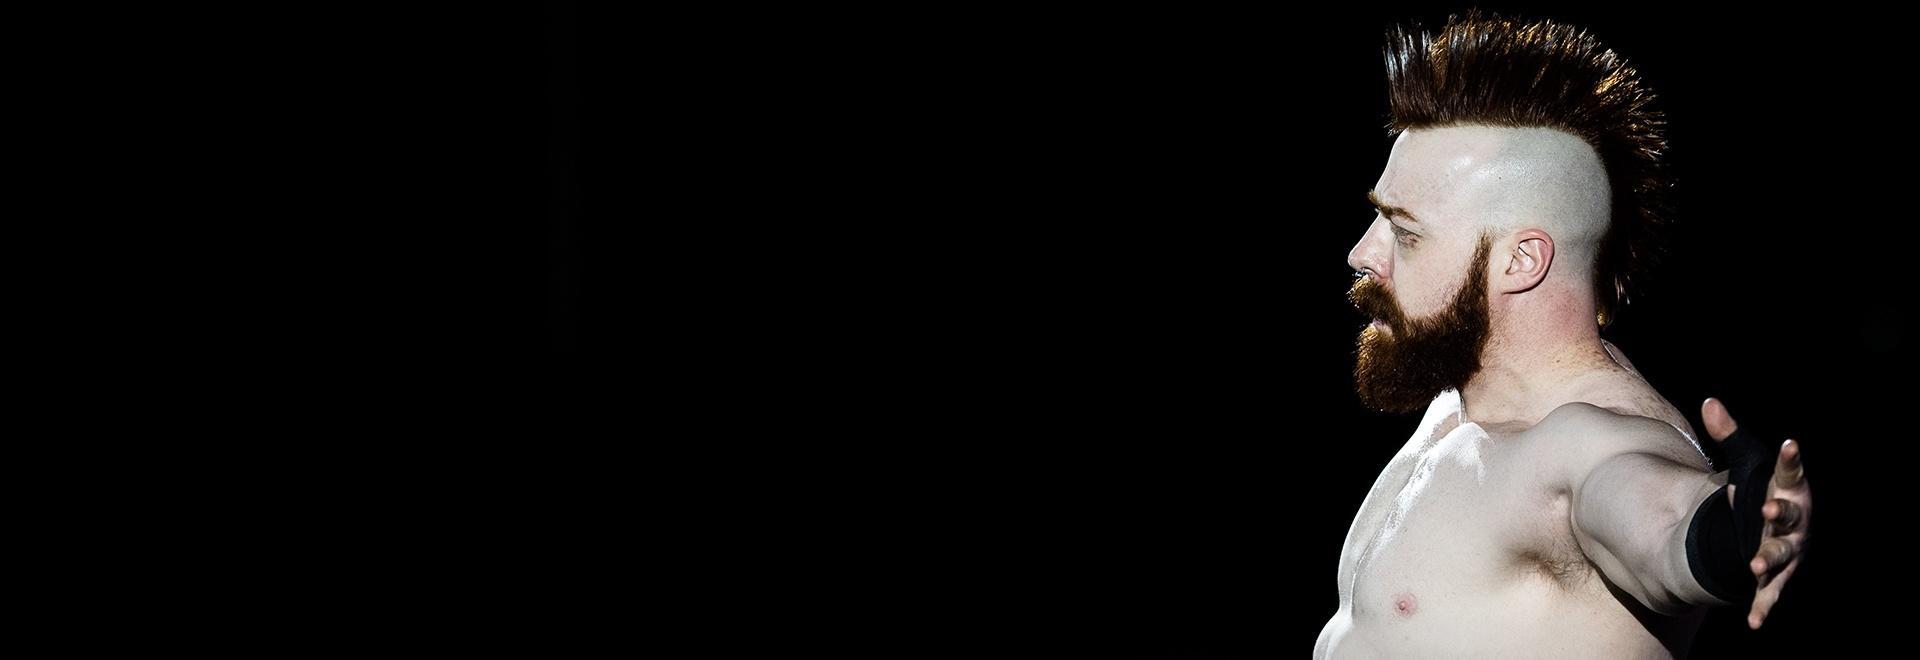 Ep. 15